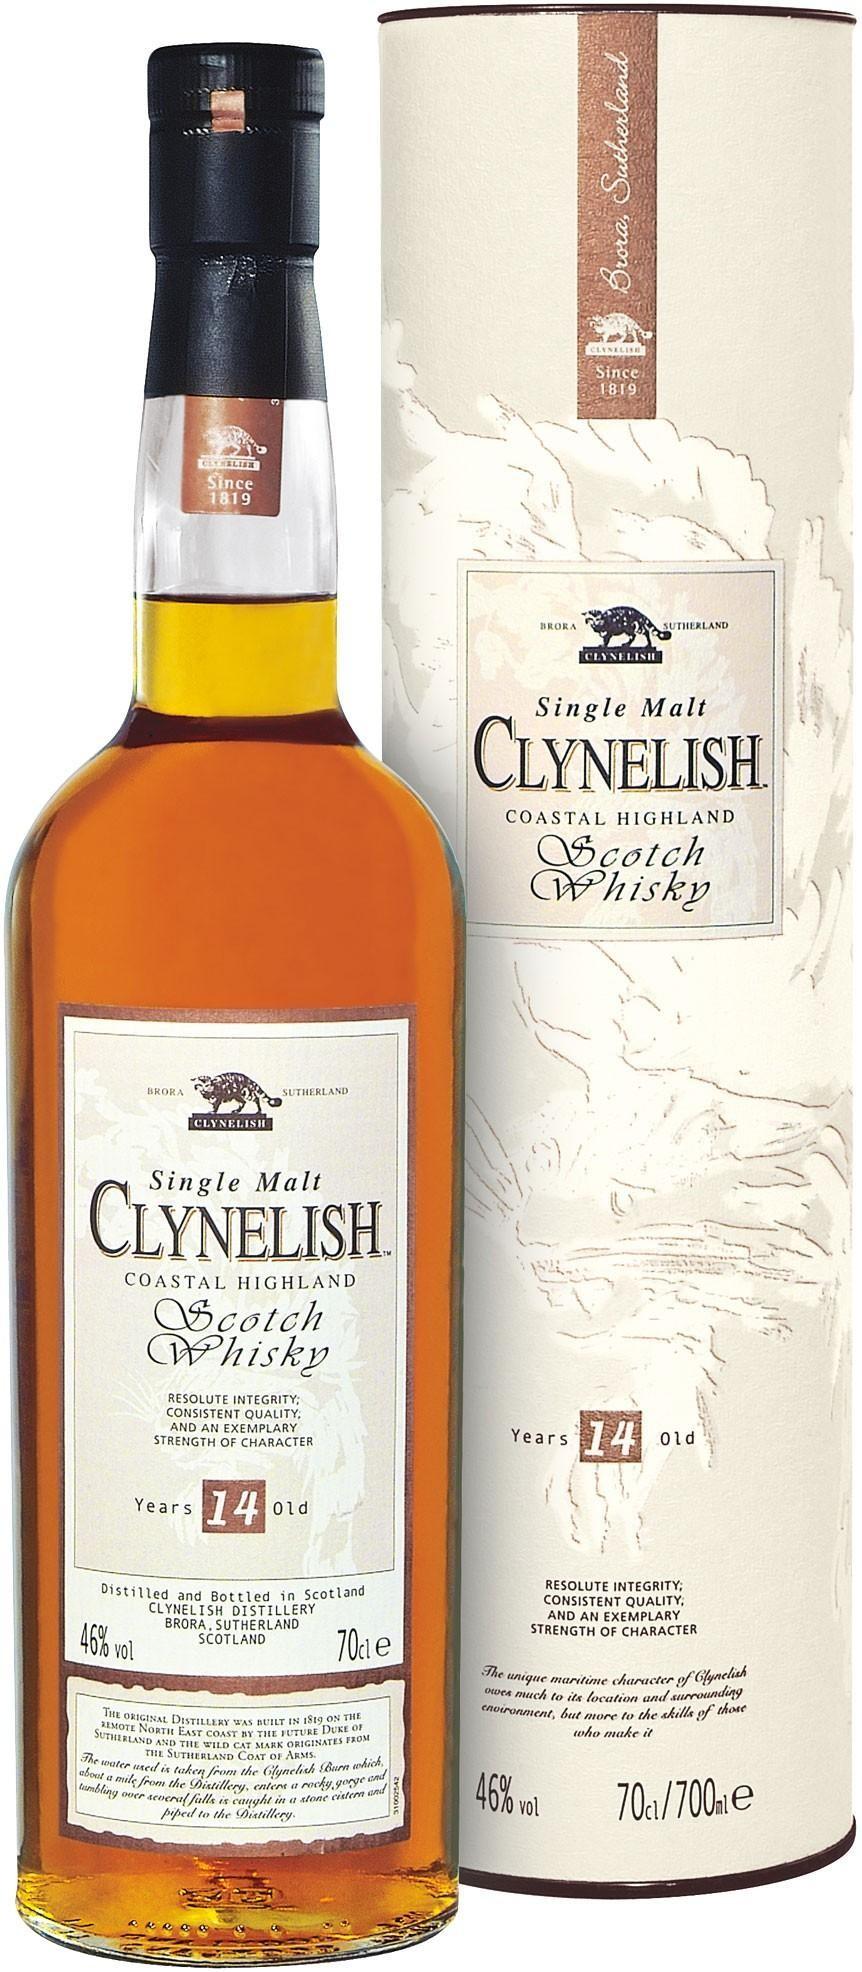 Clynelish 14 Year 70cl 46% Highland Single Malt Whisky